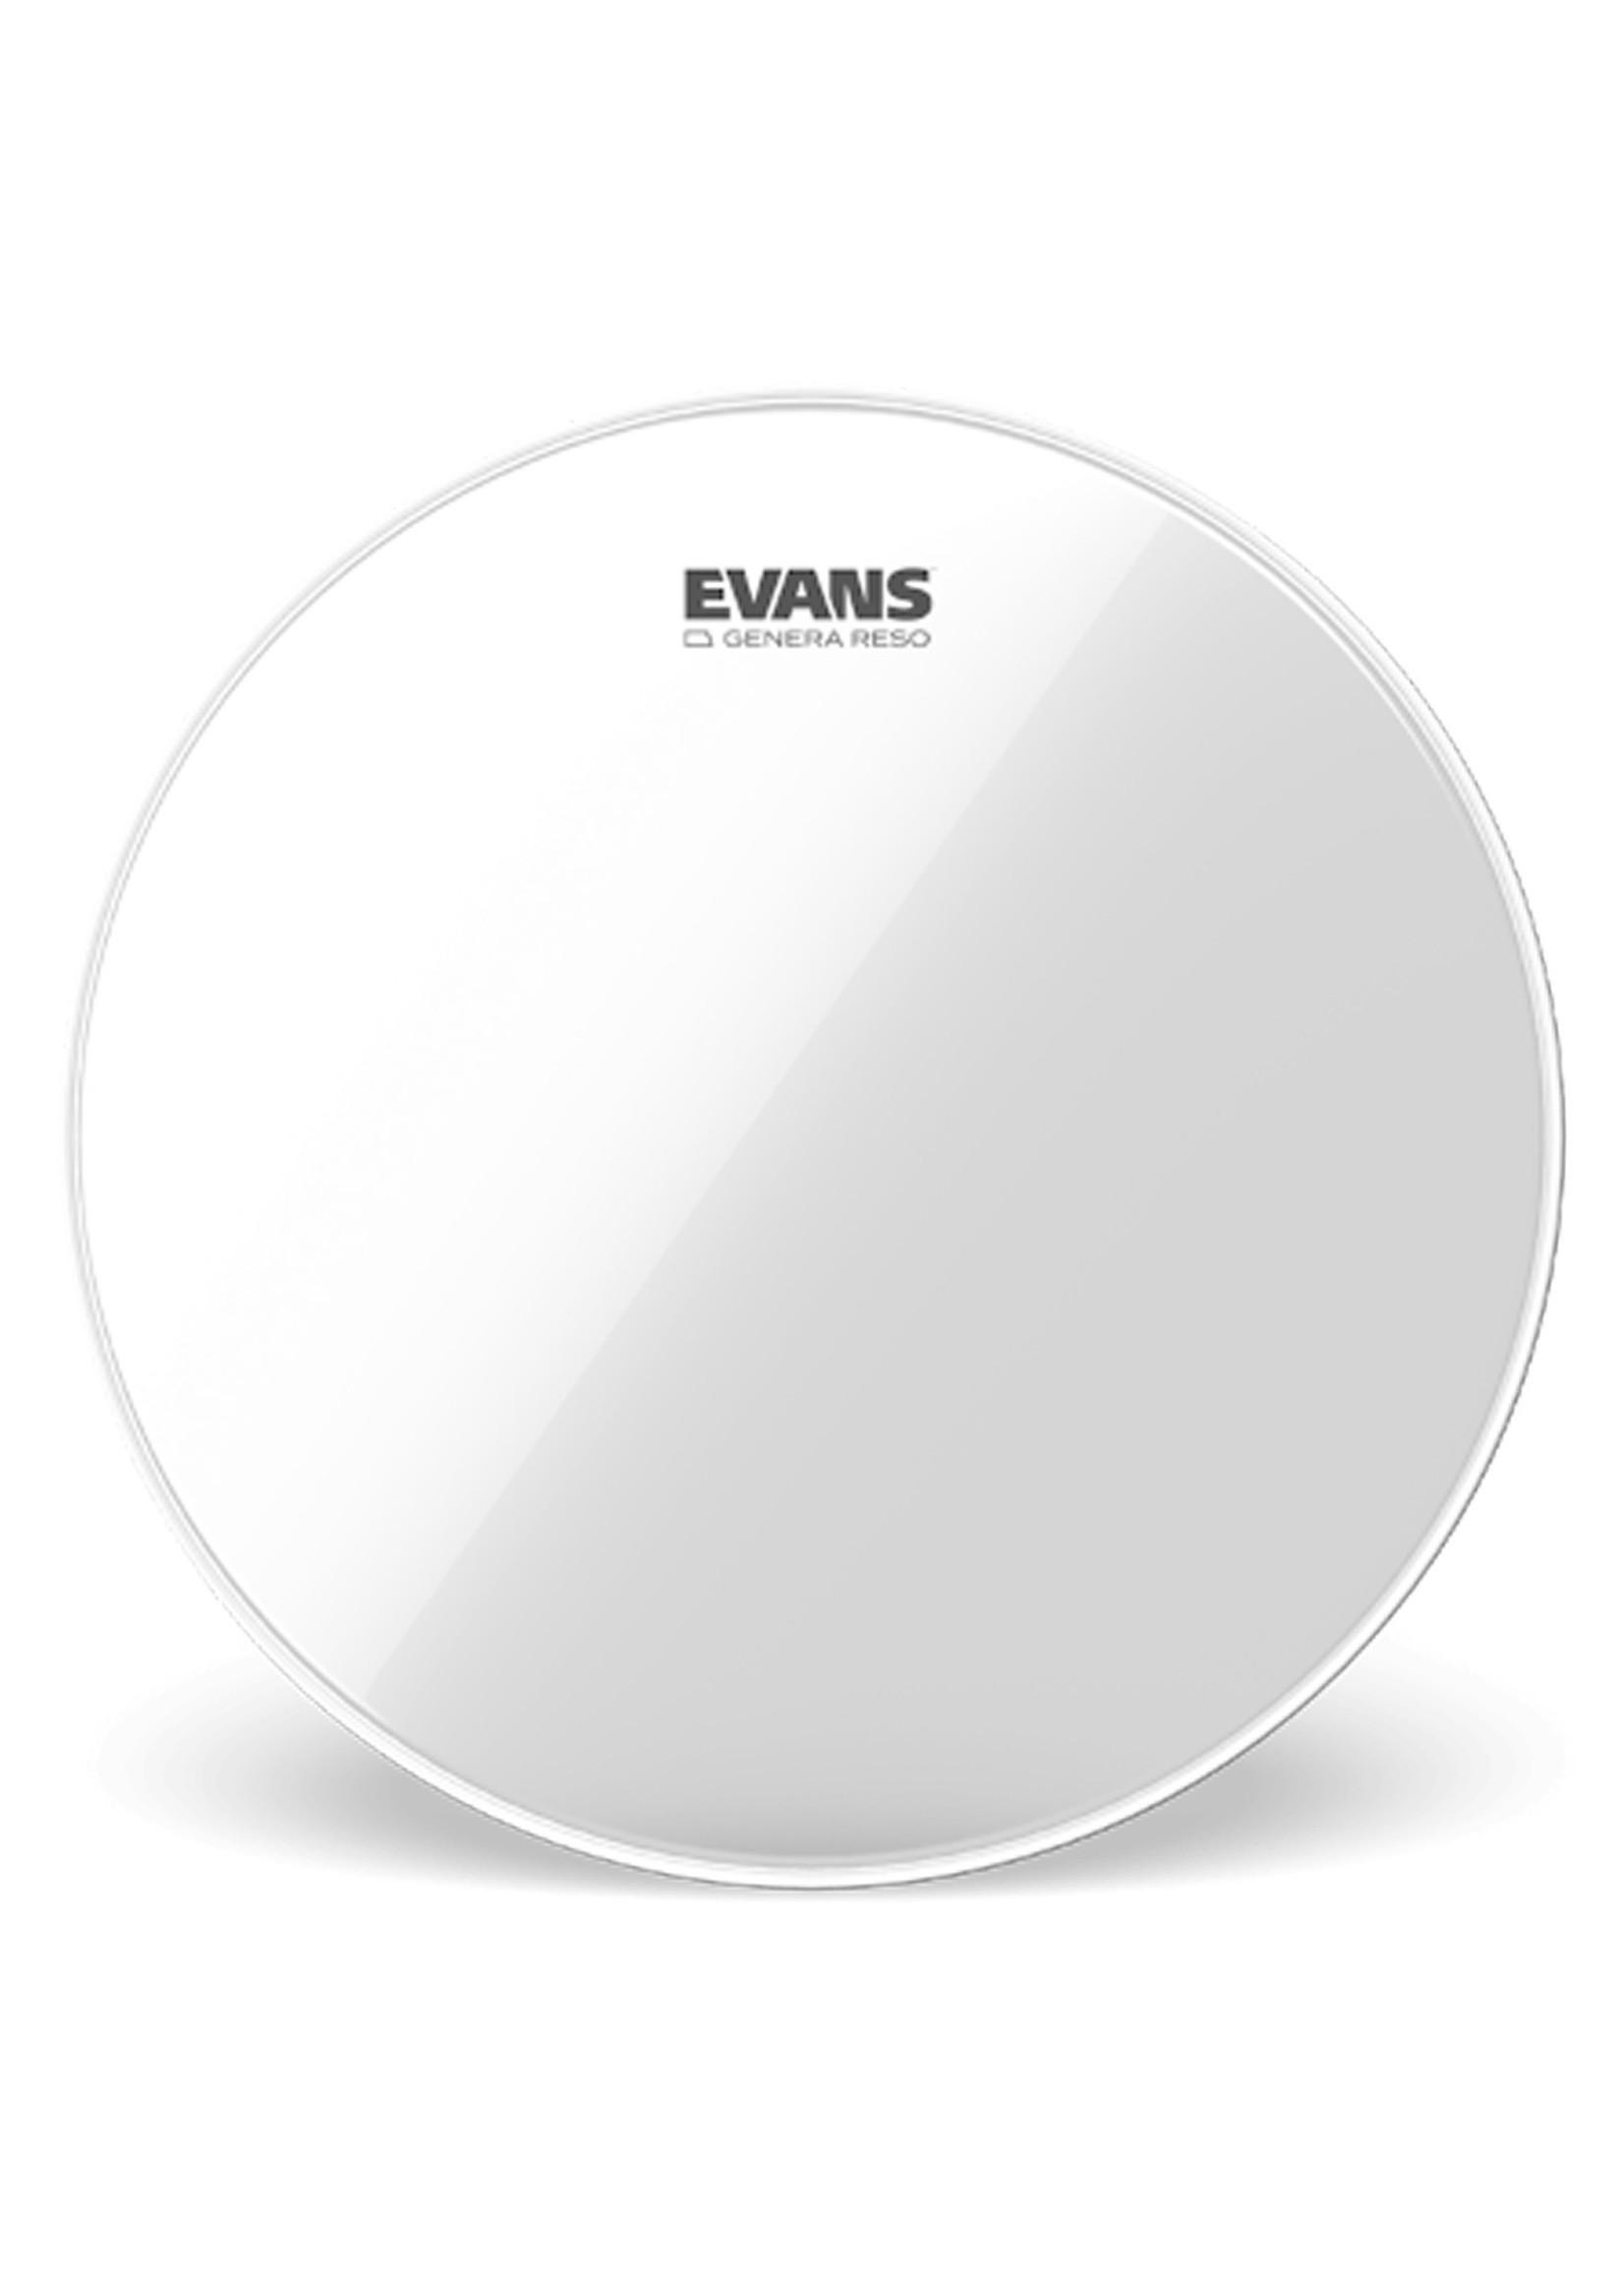 "Evans 12"" Genera Resonant"